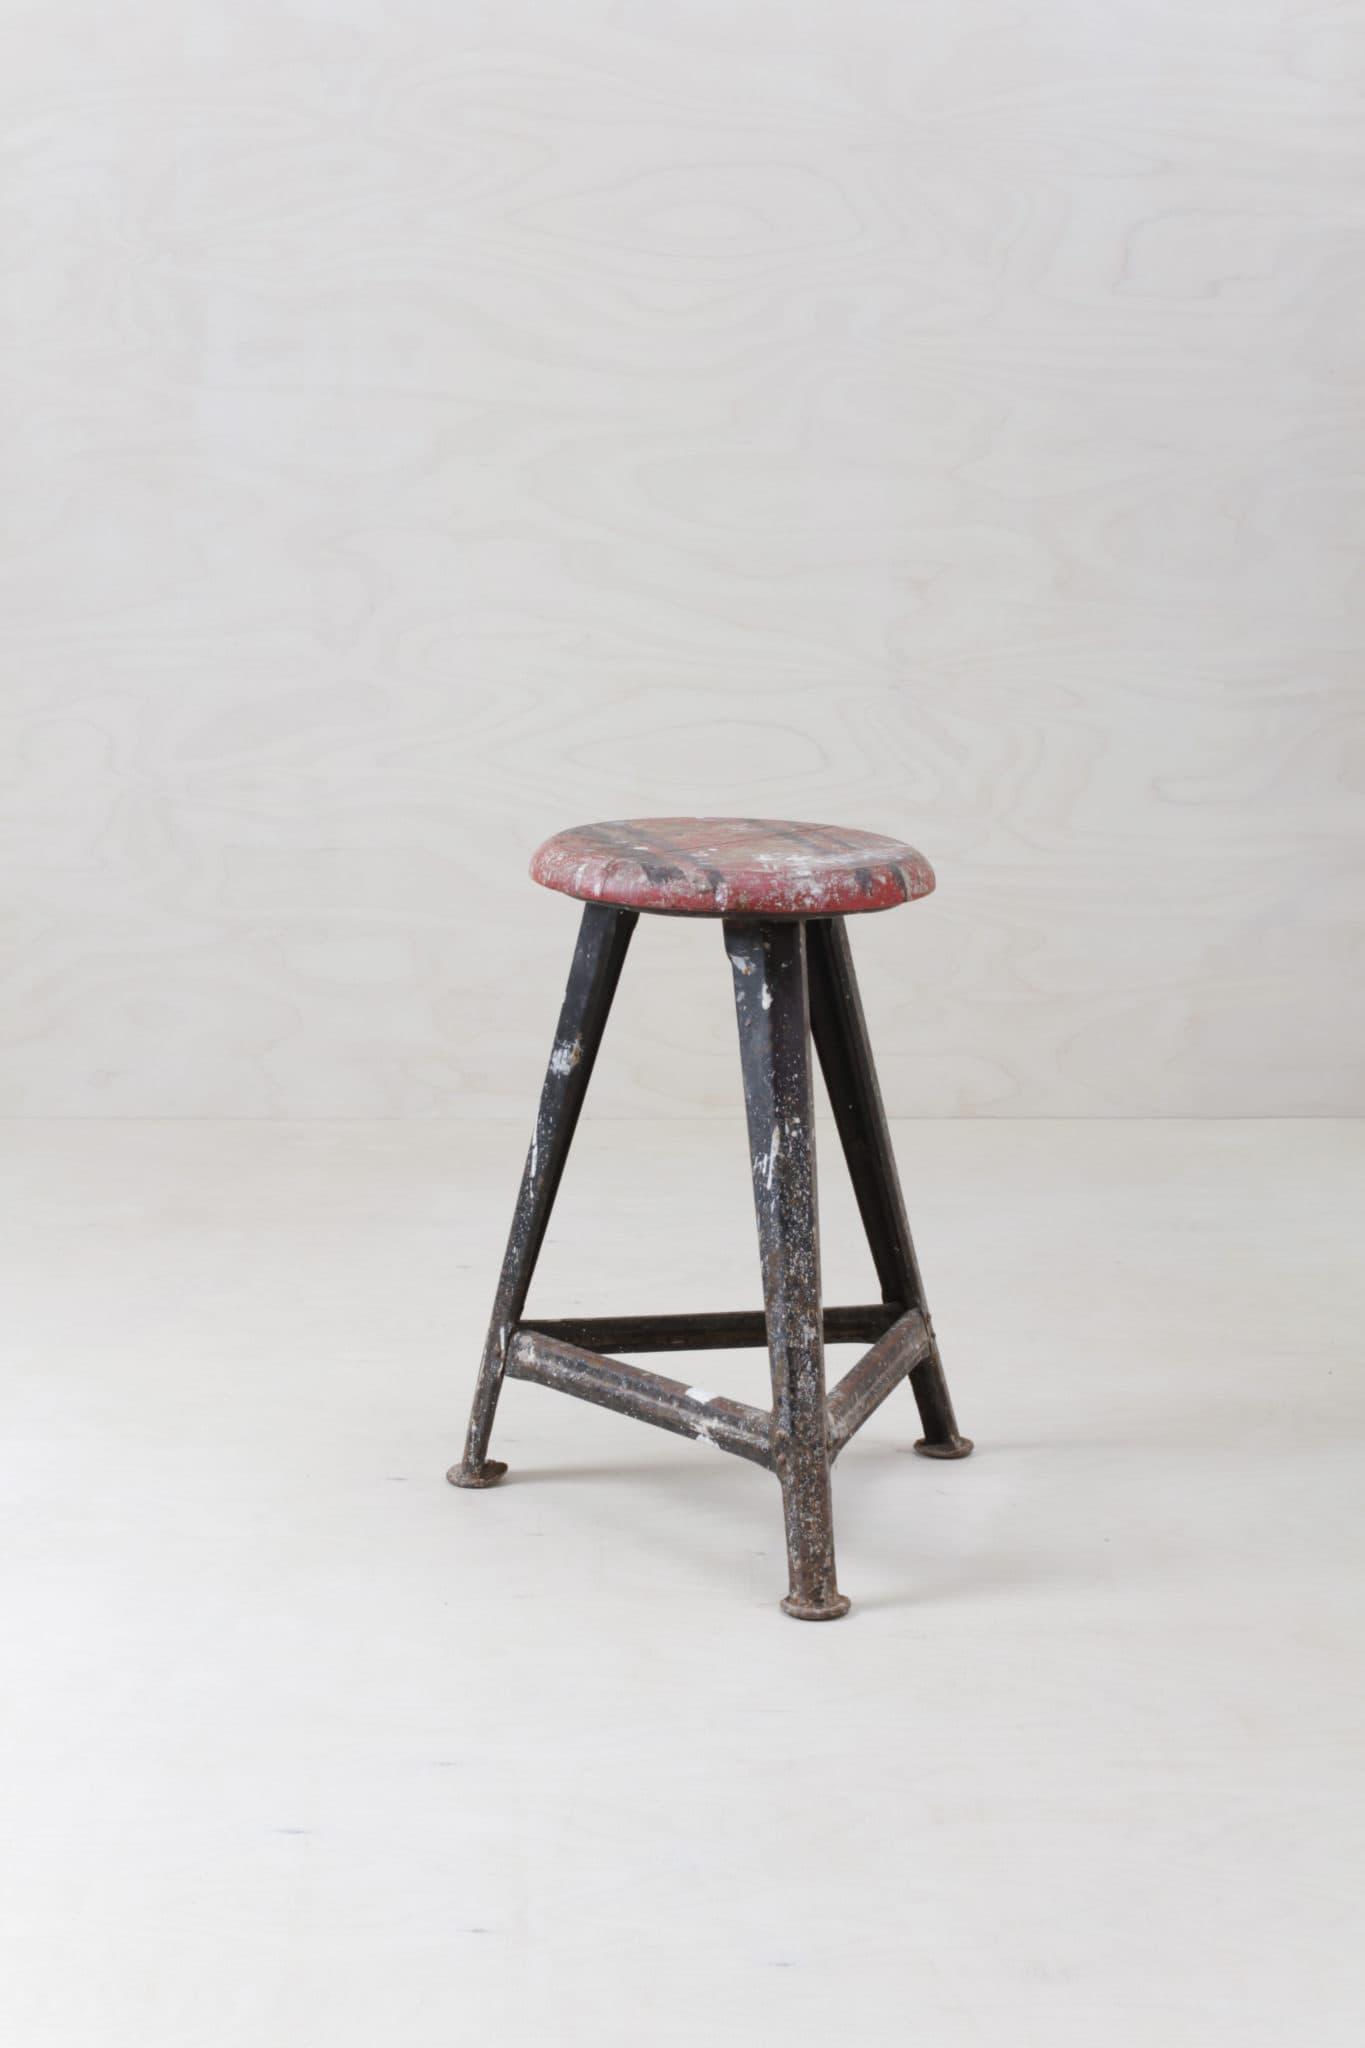 Original Rowac Hocker, Industrial Look, mieten